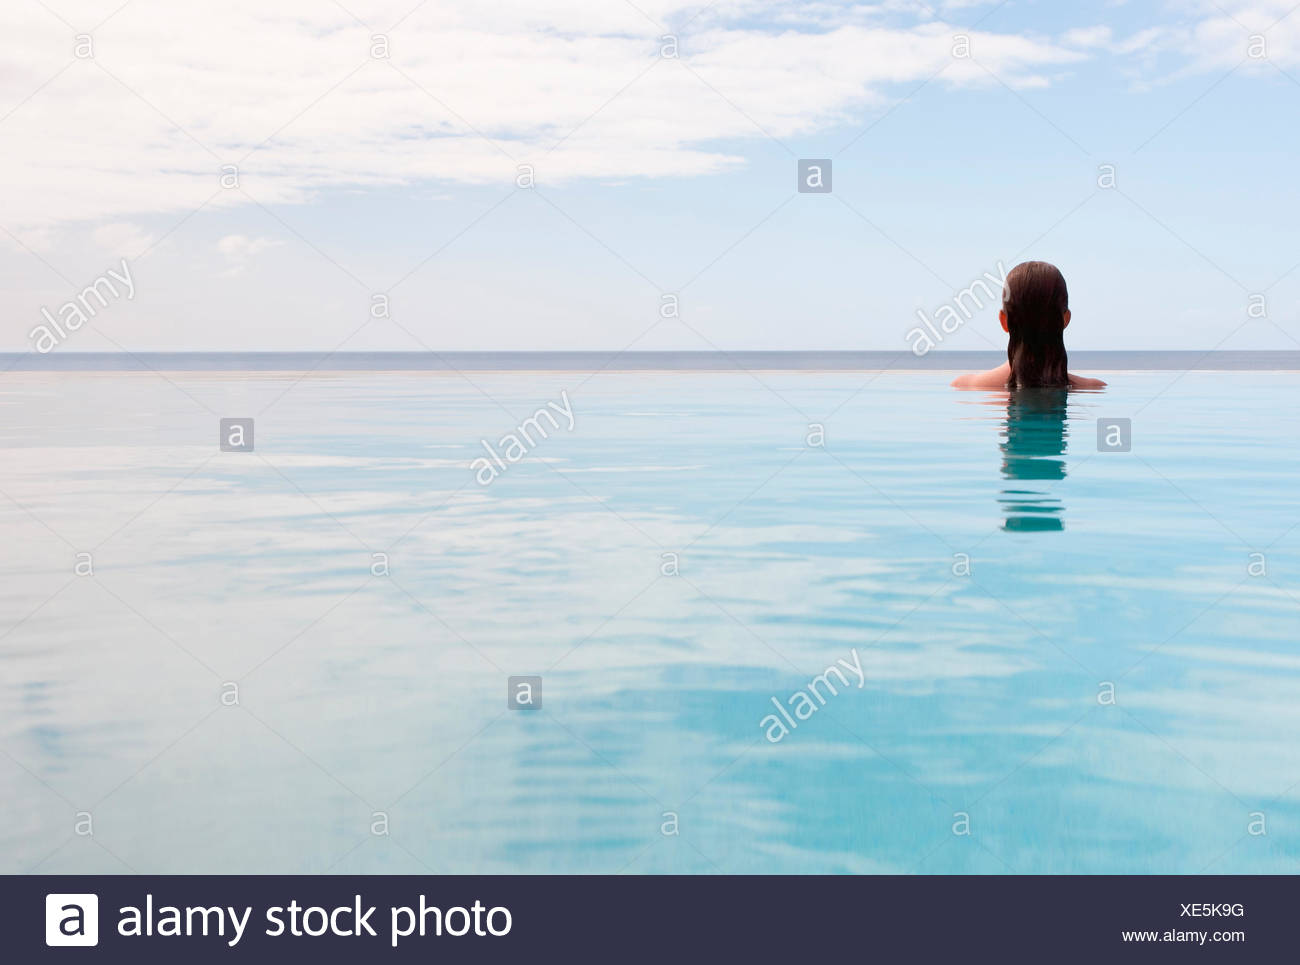 USA, Virgin Islands, St. John, Woman in swimming pool - Stock Image